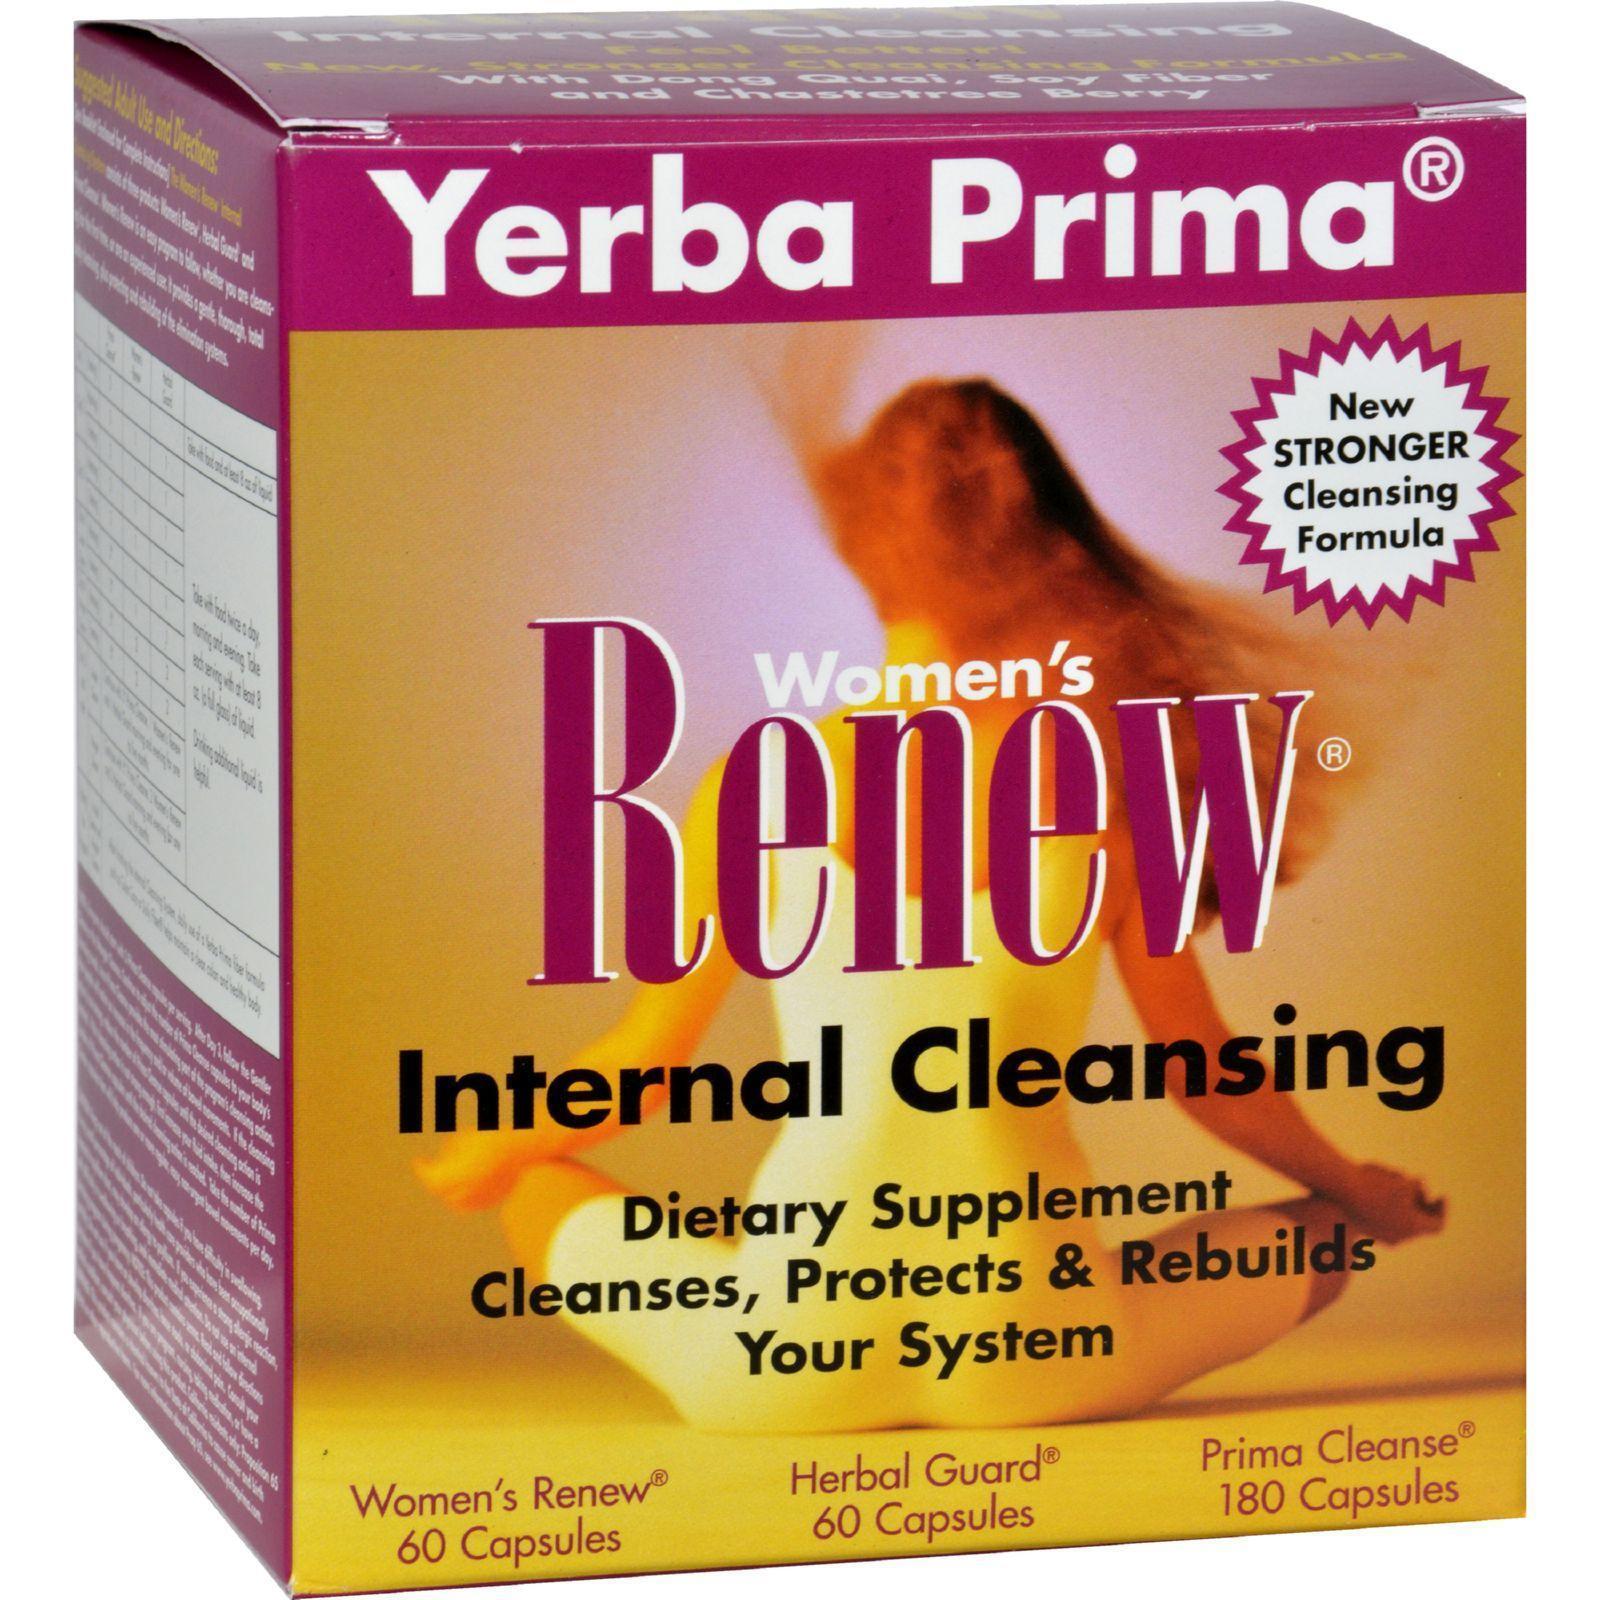 Yerba Prima Women's RENEW Internal Cleansing 3-in-1 Kit